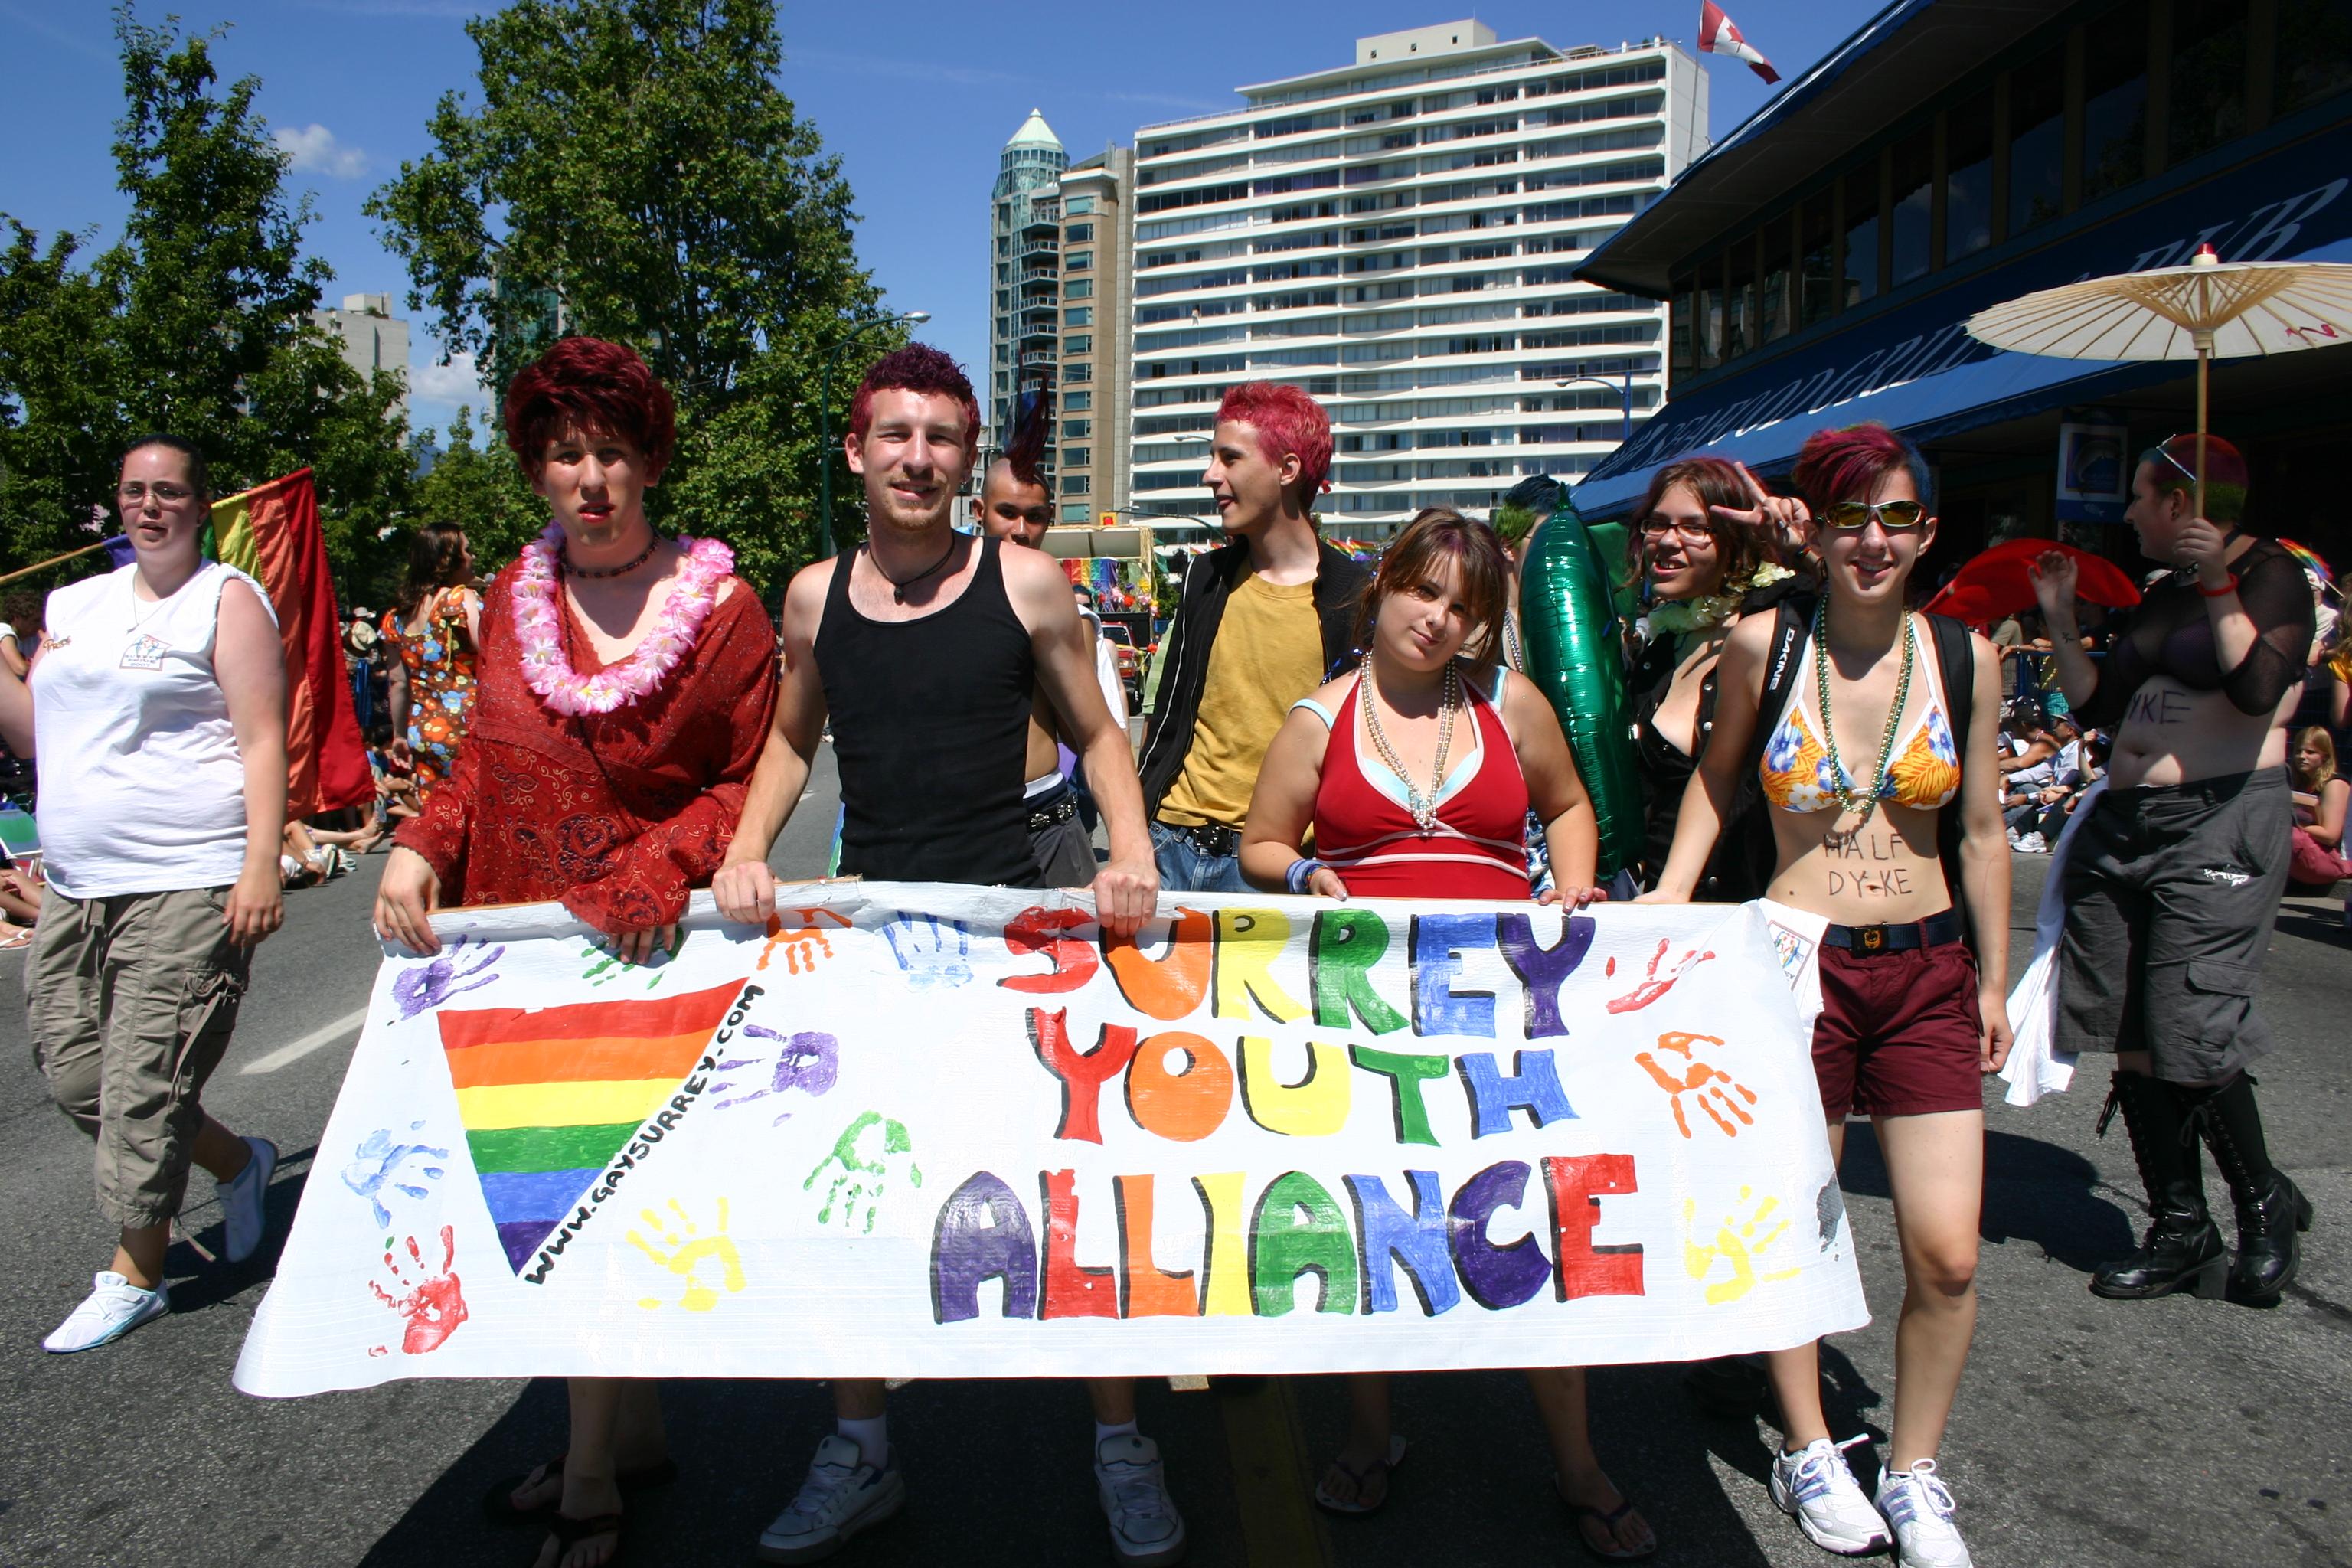 """Queer as Folk"", lesbisch-schwul, beim Vancouver Pride in Britisch Columbia, Kanada"